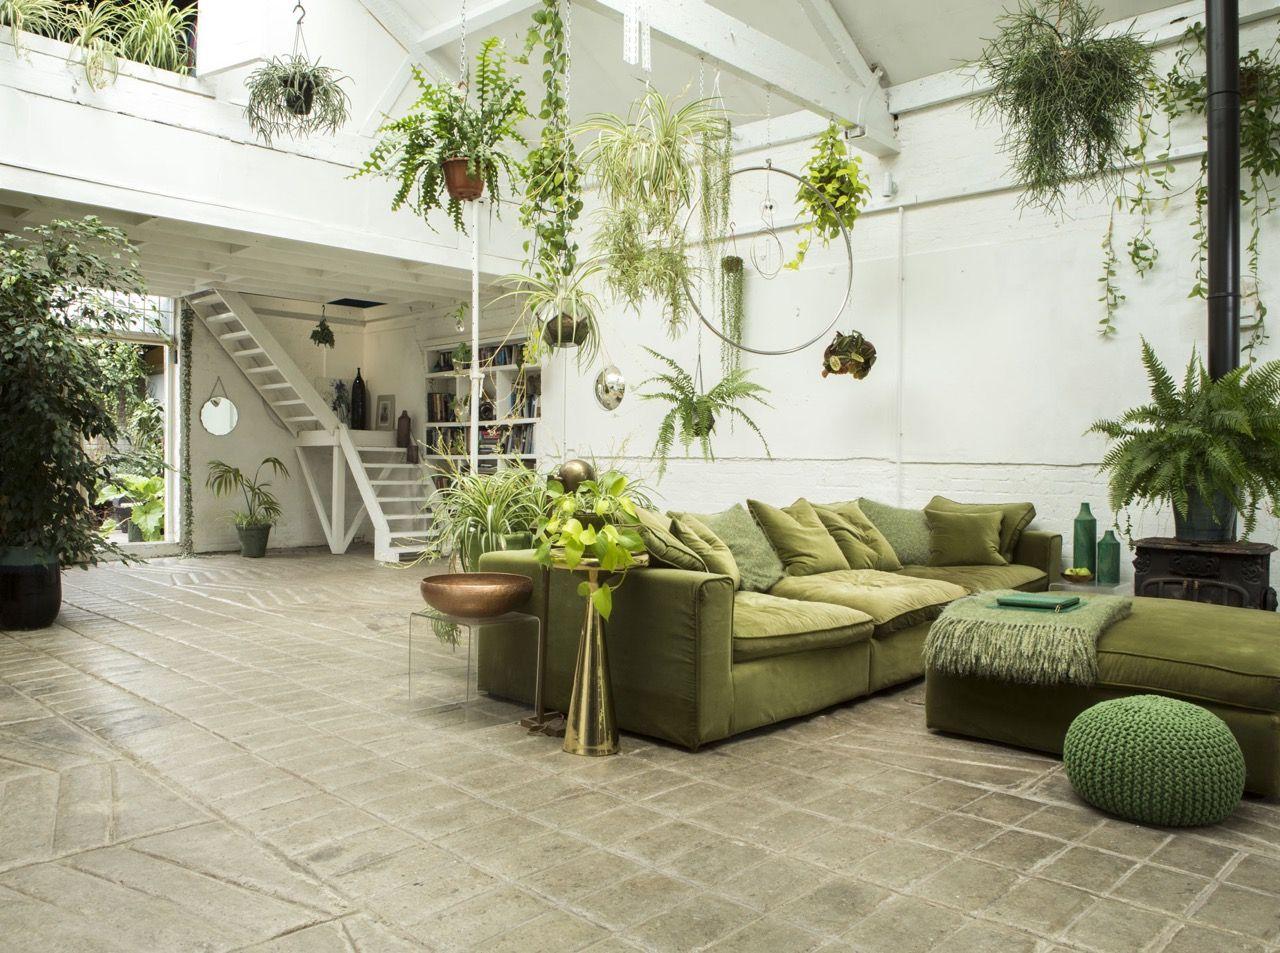 7 Amazing Interiors Inspired By Pantone 2017 Greenery Indoor PlantersPlants IndoorInterior Design BlogsIn LondonLiving